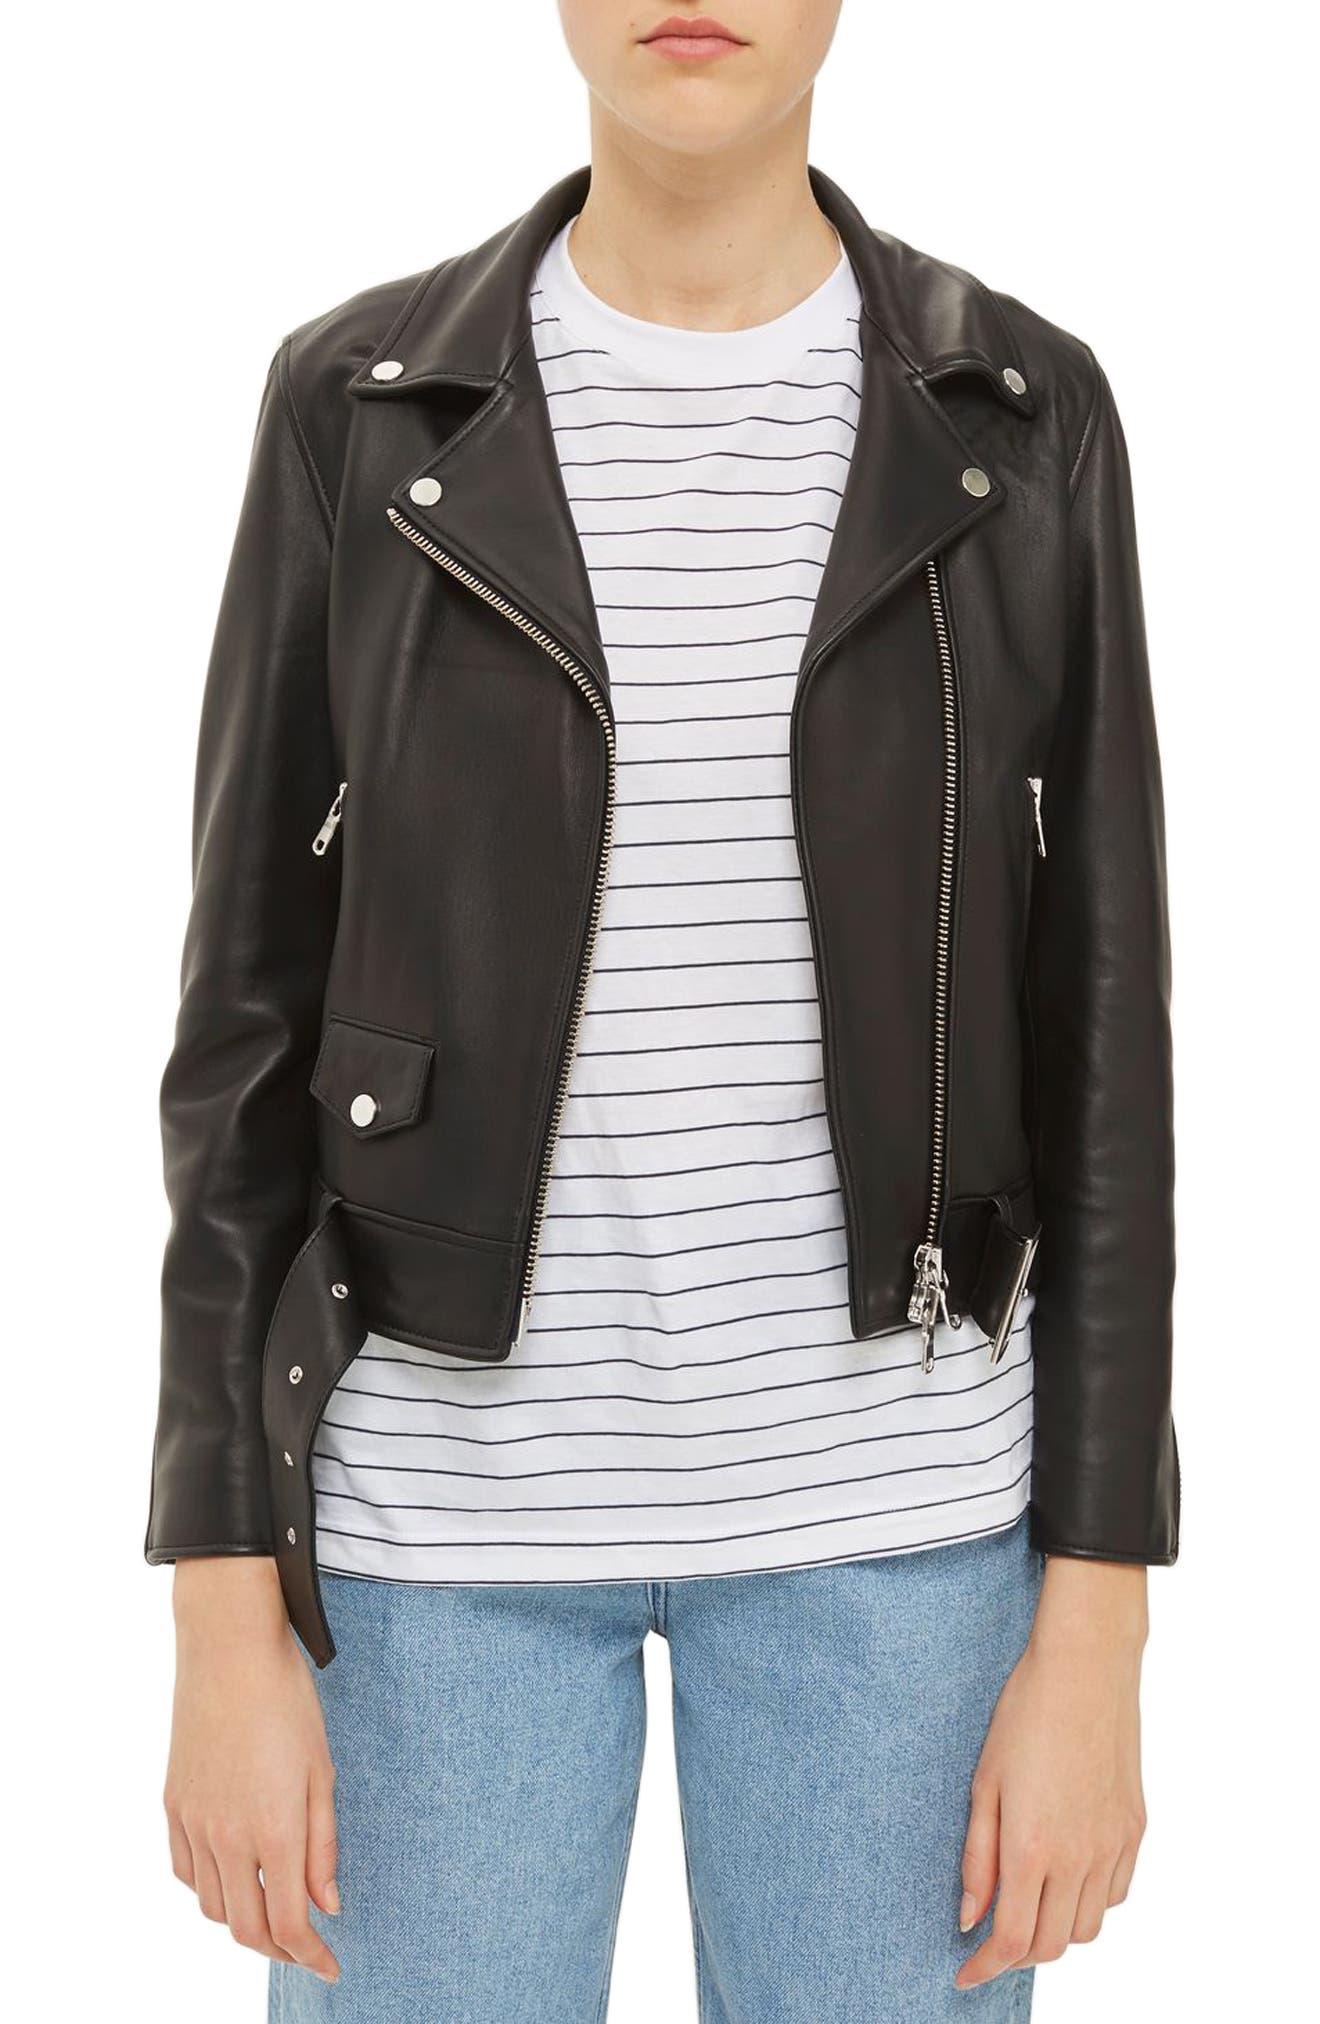 Topshop Boutique Leather Biker Jacket